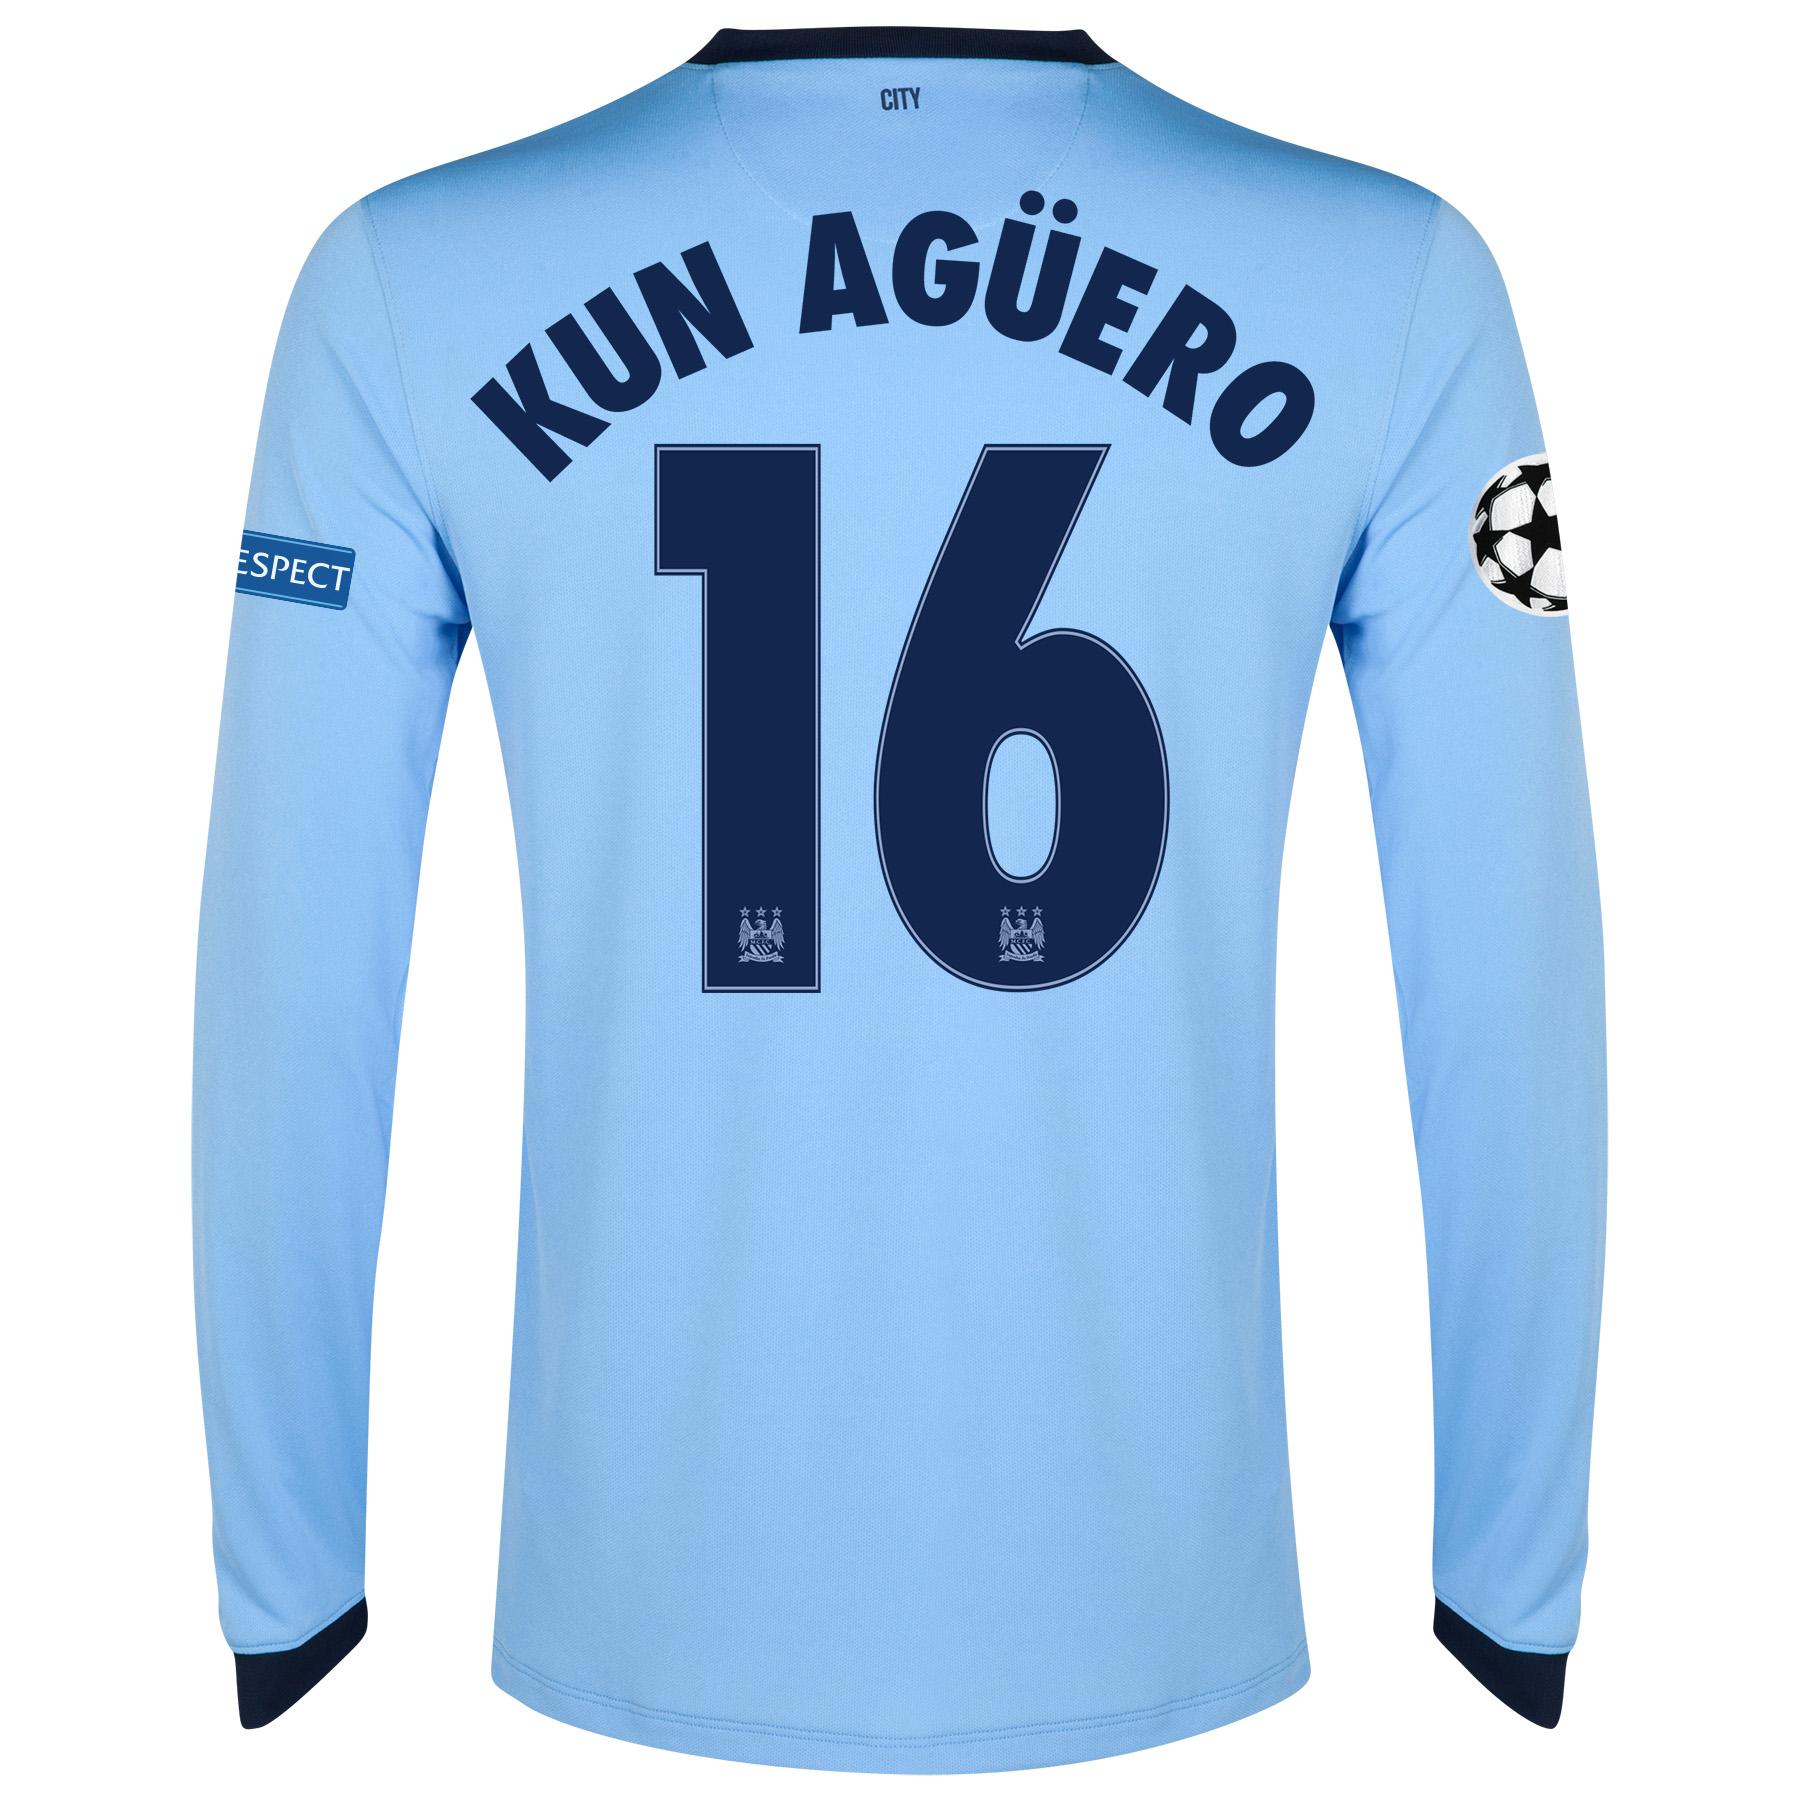 Manchester City UEFA Champions League Home Shirt 2014/15 - Long Sleeve - Kids Sky Blue with Kun Agüero  16 printing